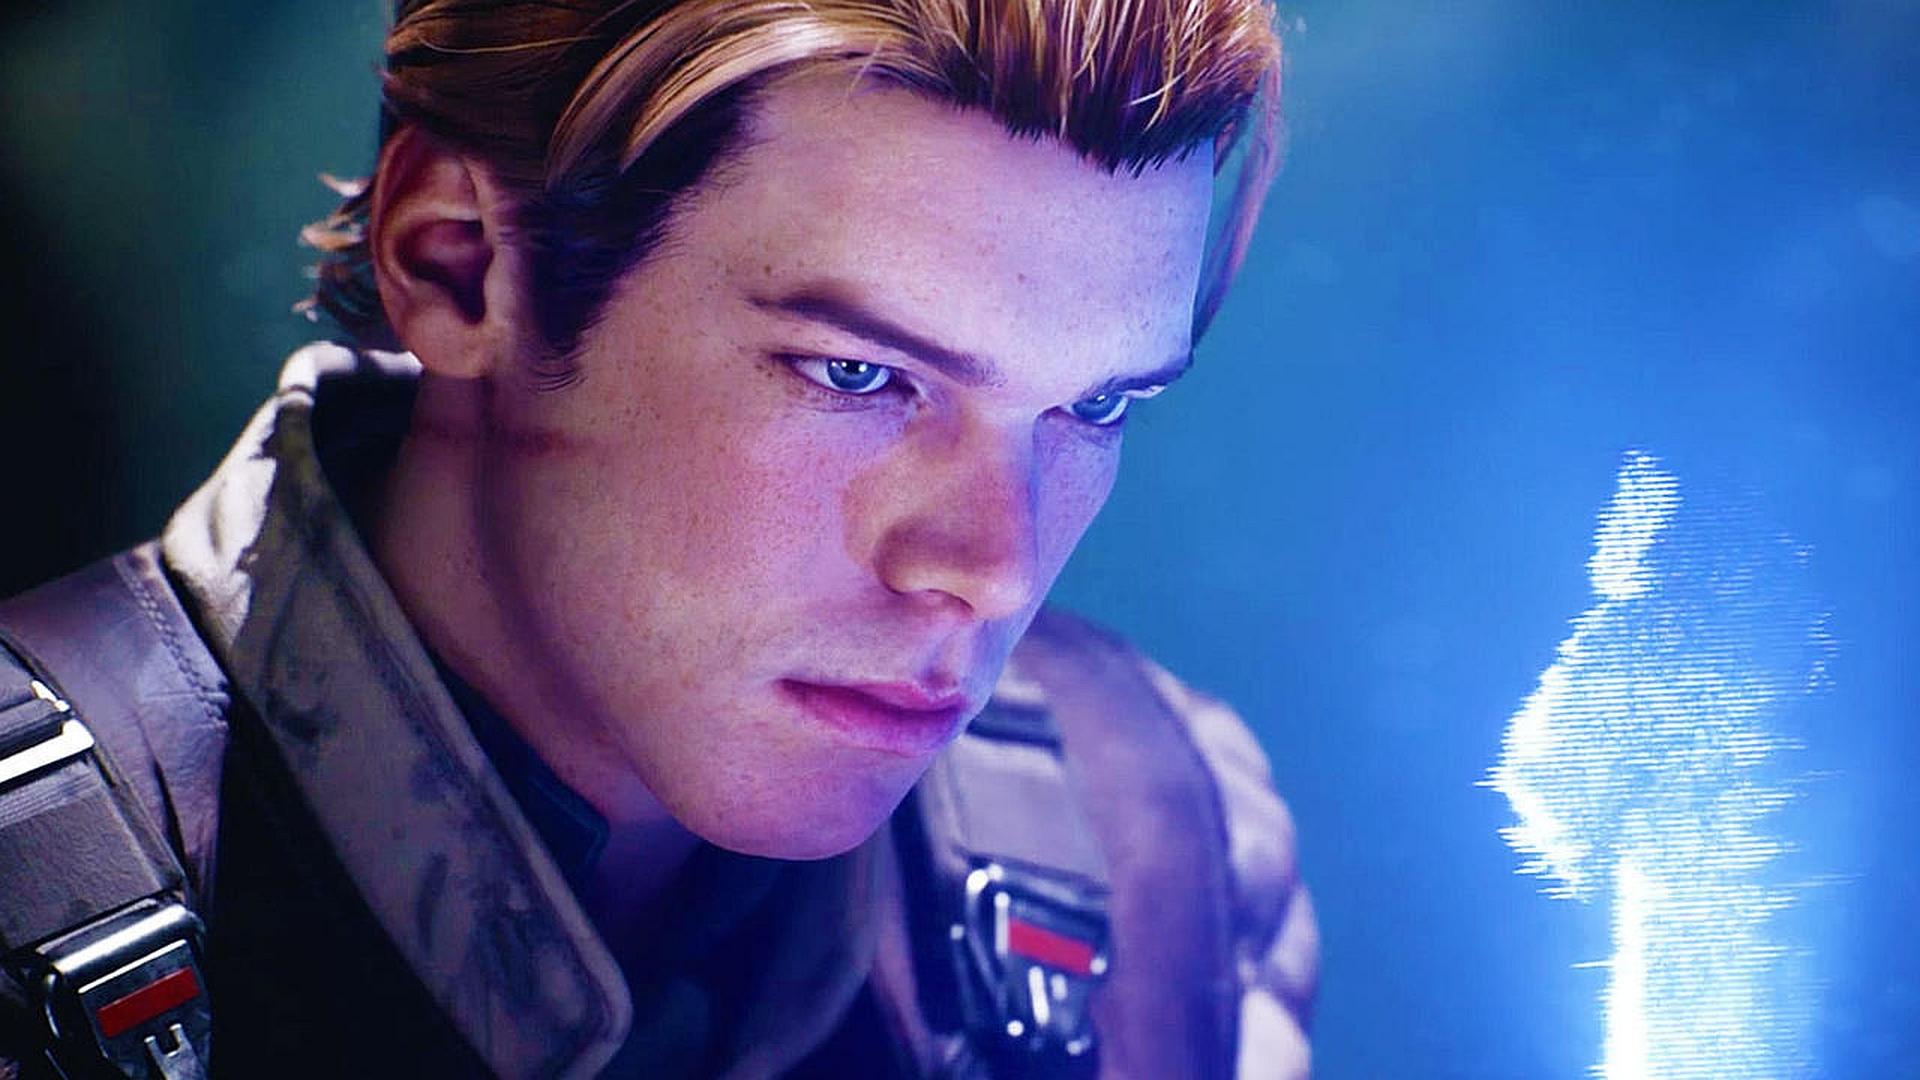 Star Wars Jedi: Fallen Order's lead is male because of Rey